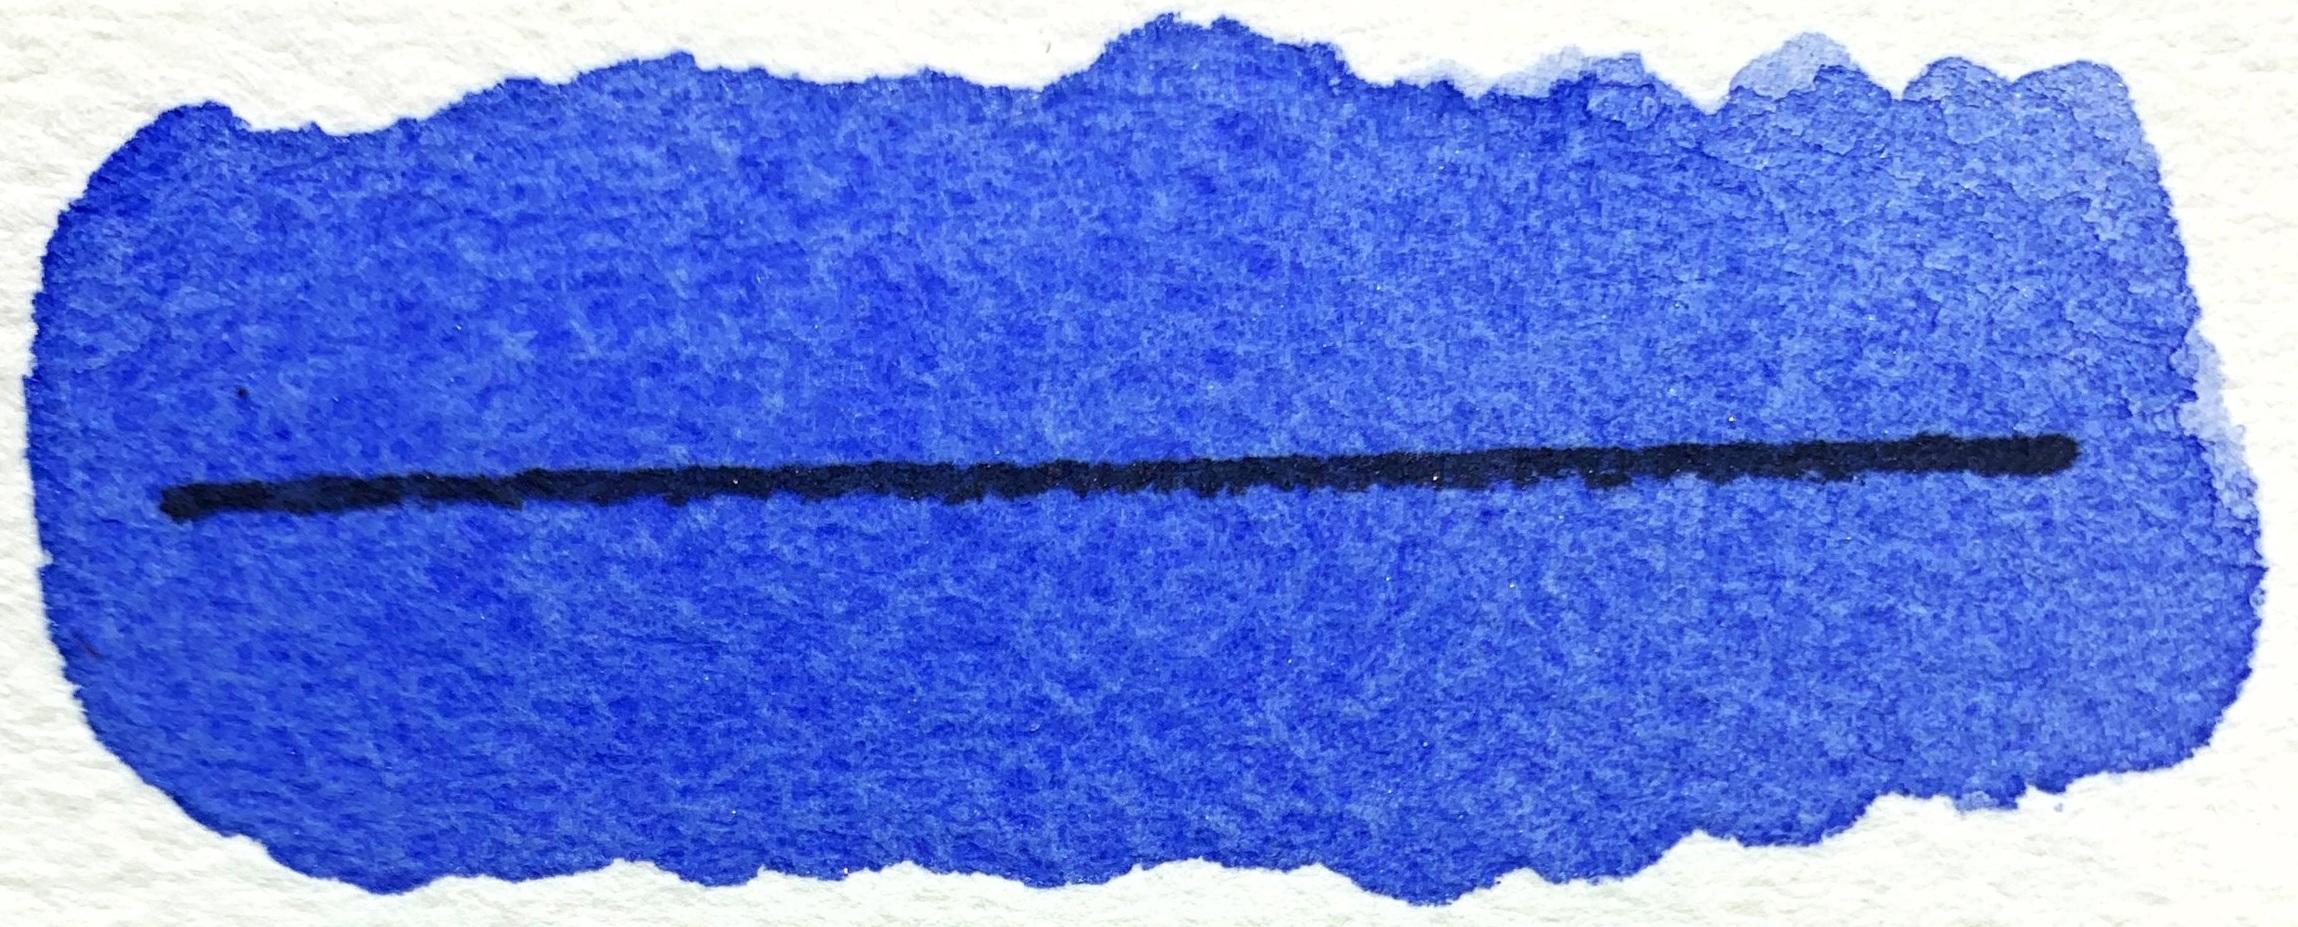 High Tide - PB29, semitransparent, excellent lightfastness , staining